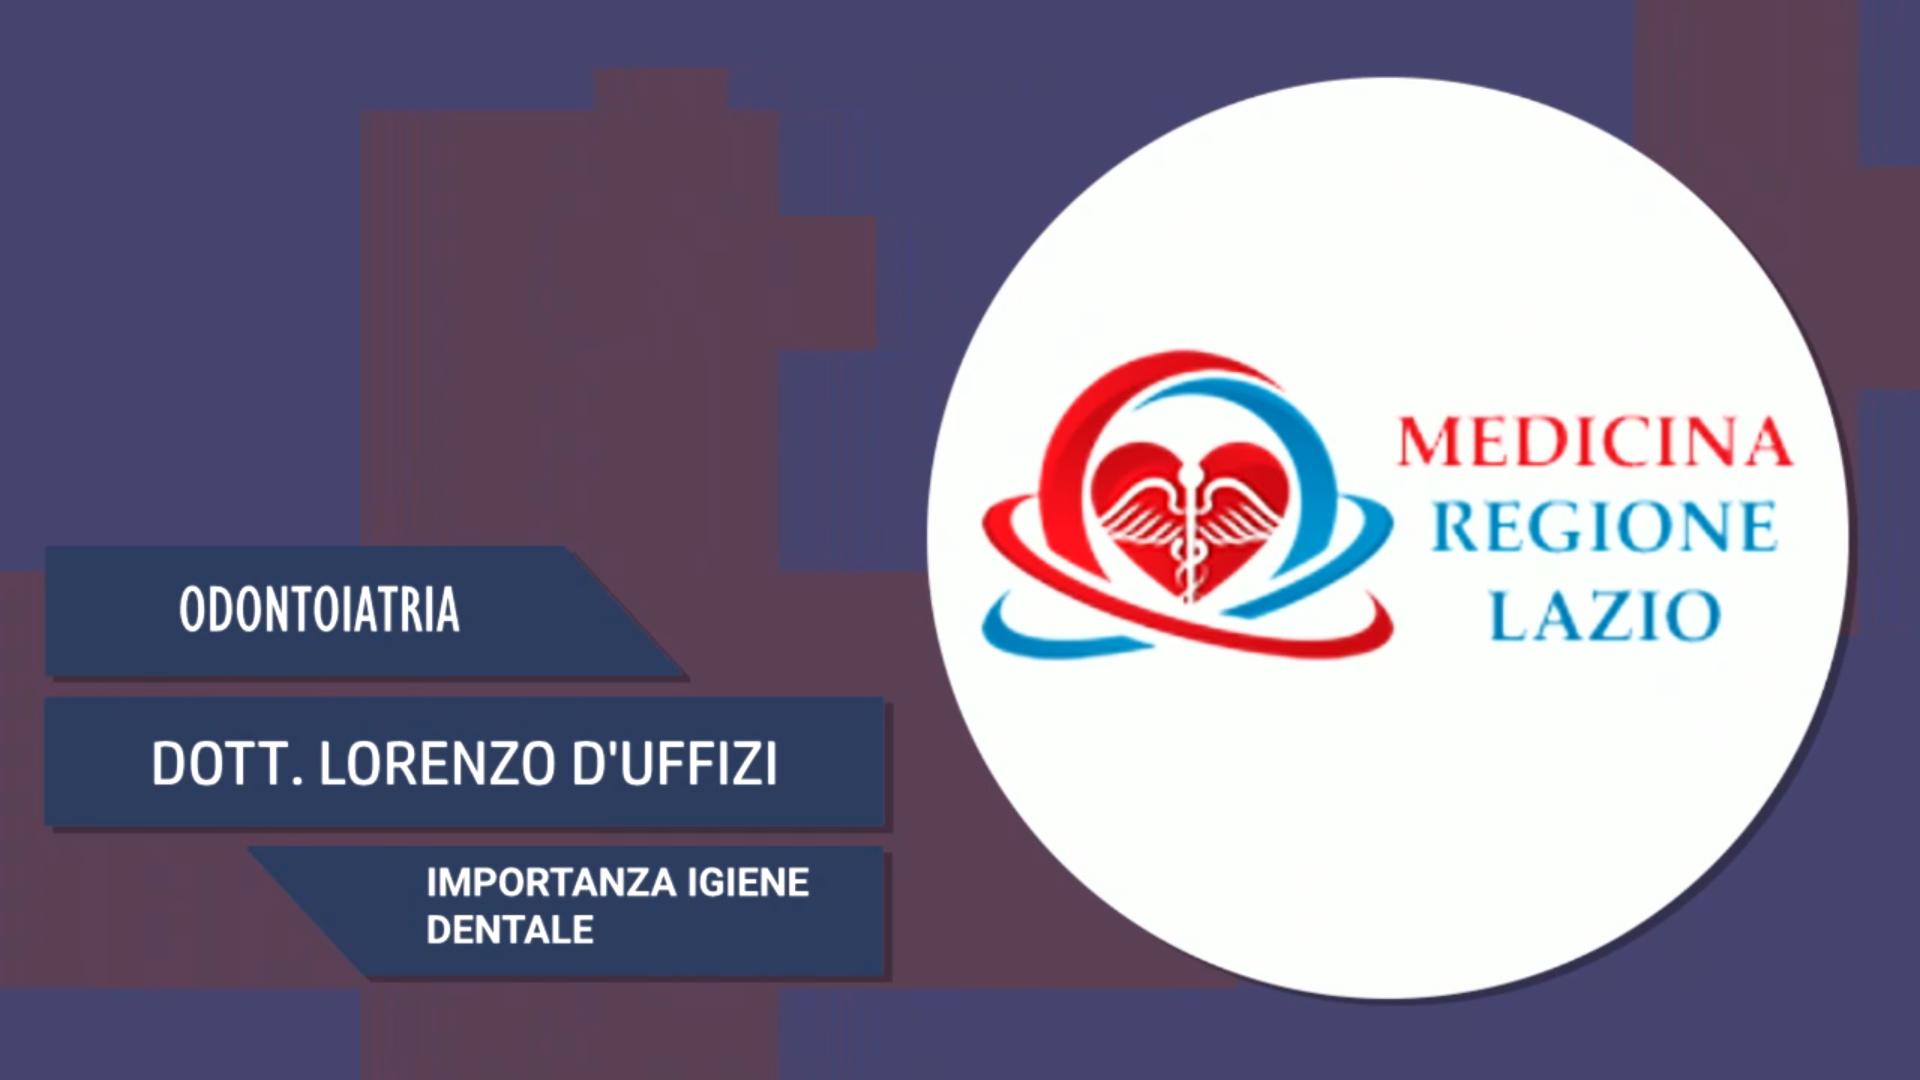 Intervista al Dott. Lorenzo D'Uffizi – Importanza igiene dentale